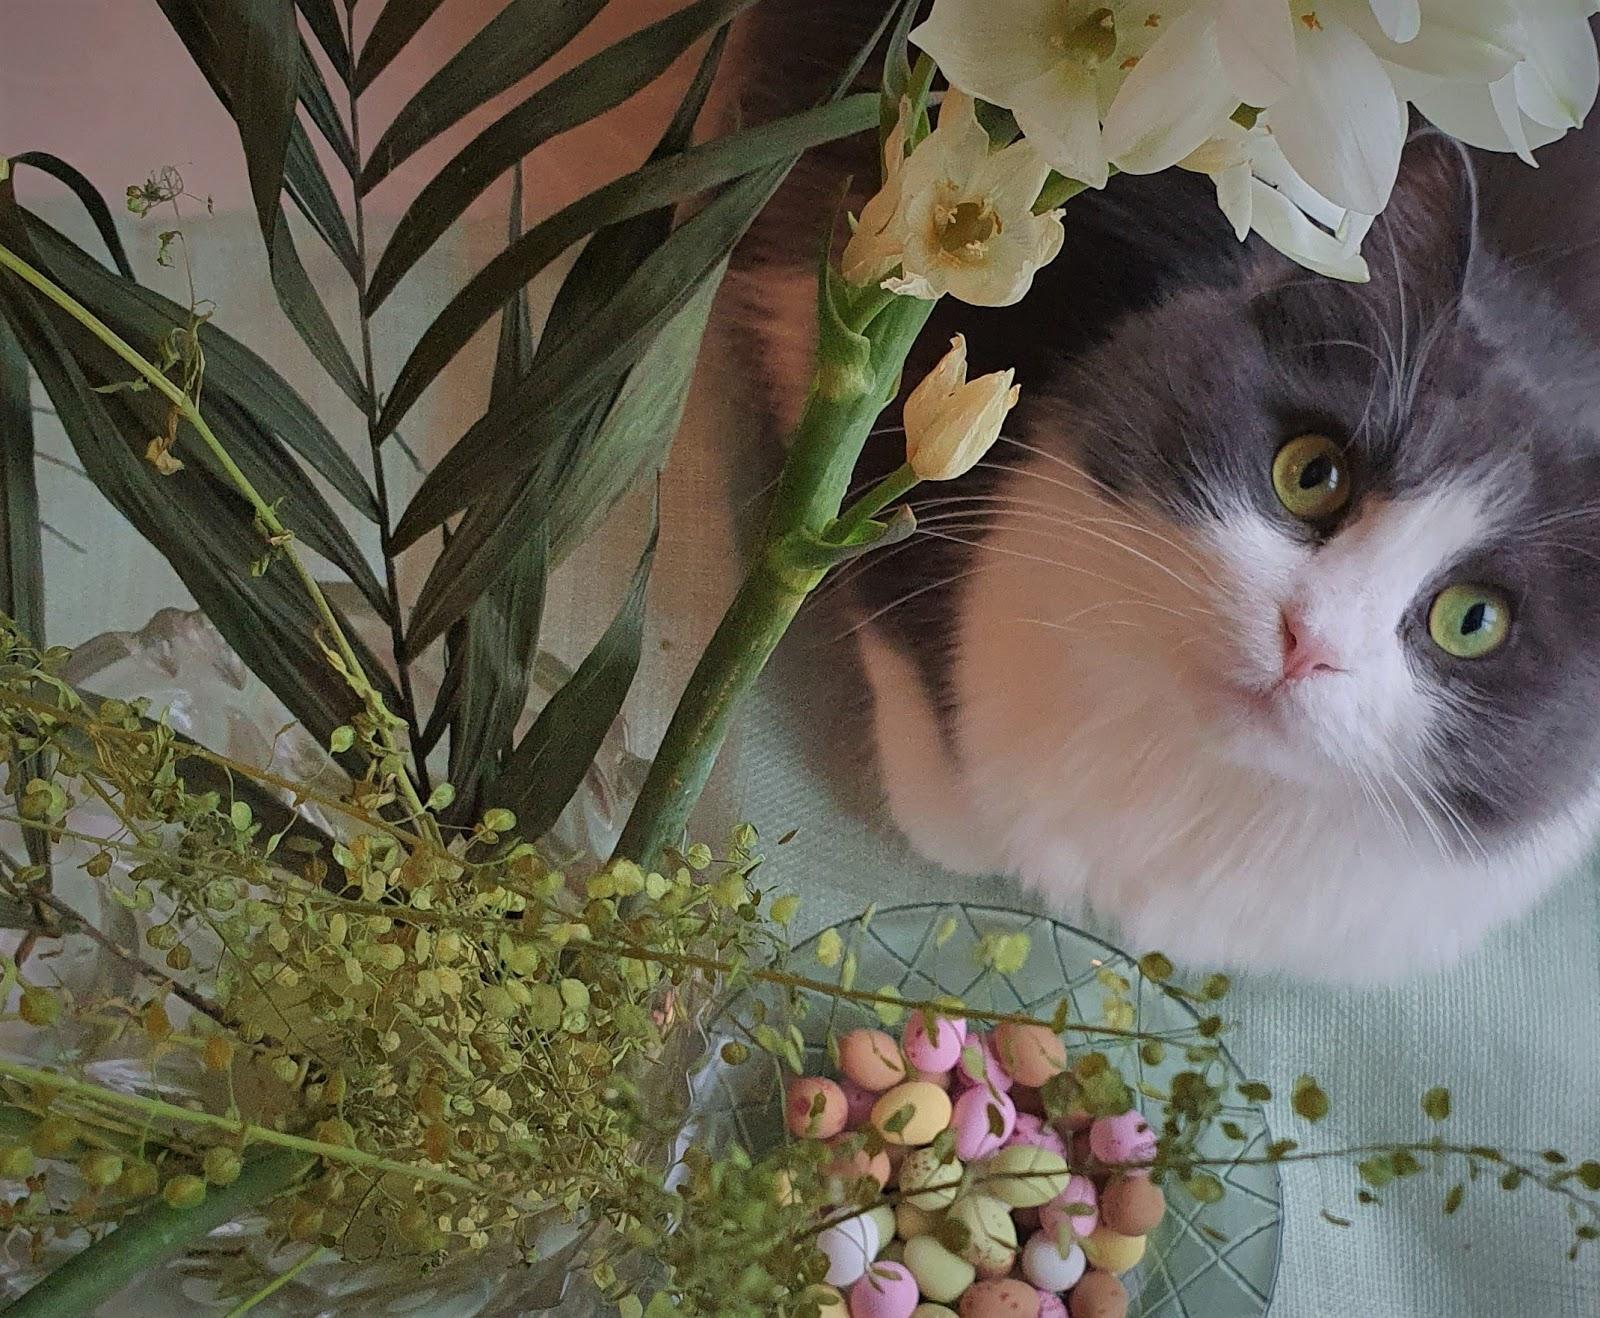 pääsiäismunat ja micu-kissa